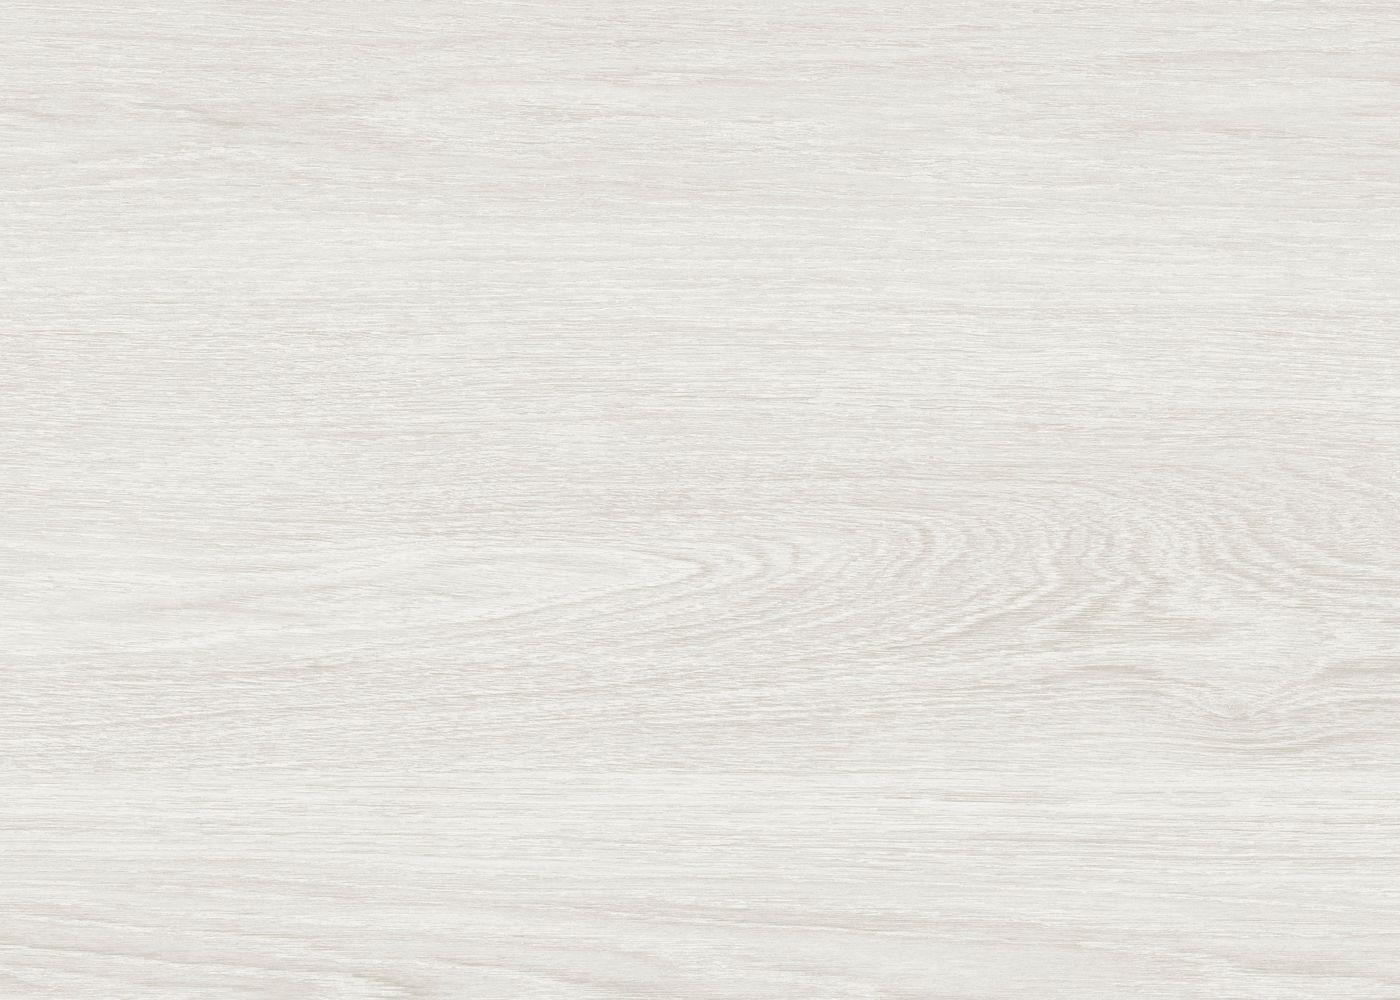 Sol stratifié Charme Blanc - Impulse 8 G2 - 8x190x1288